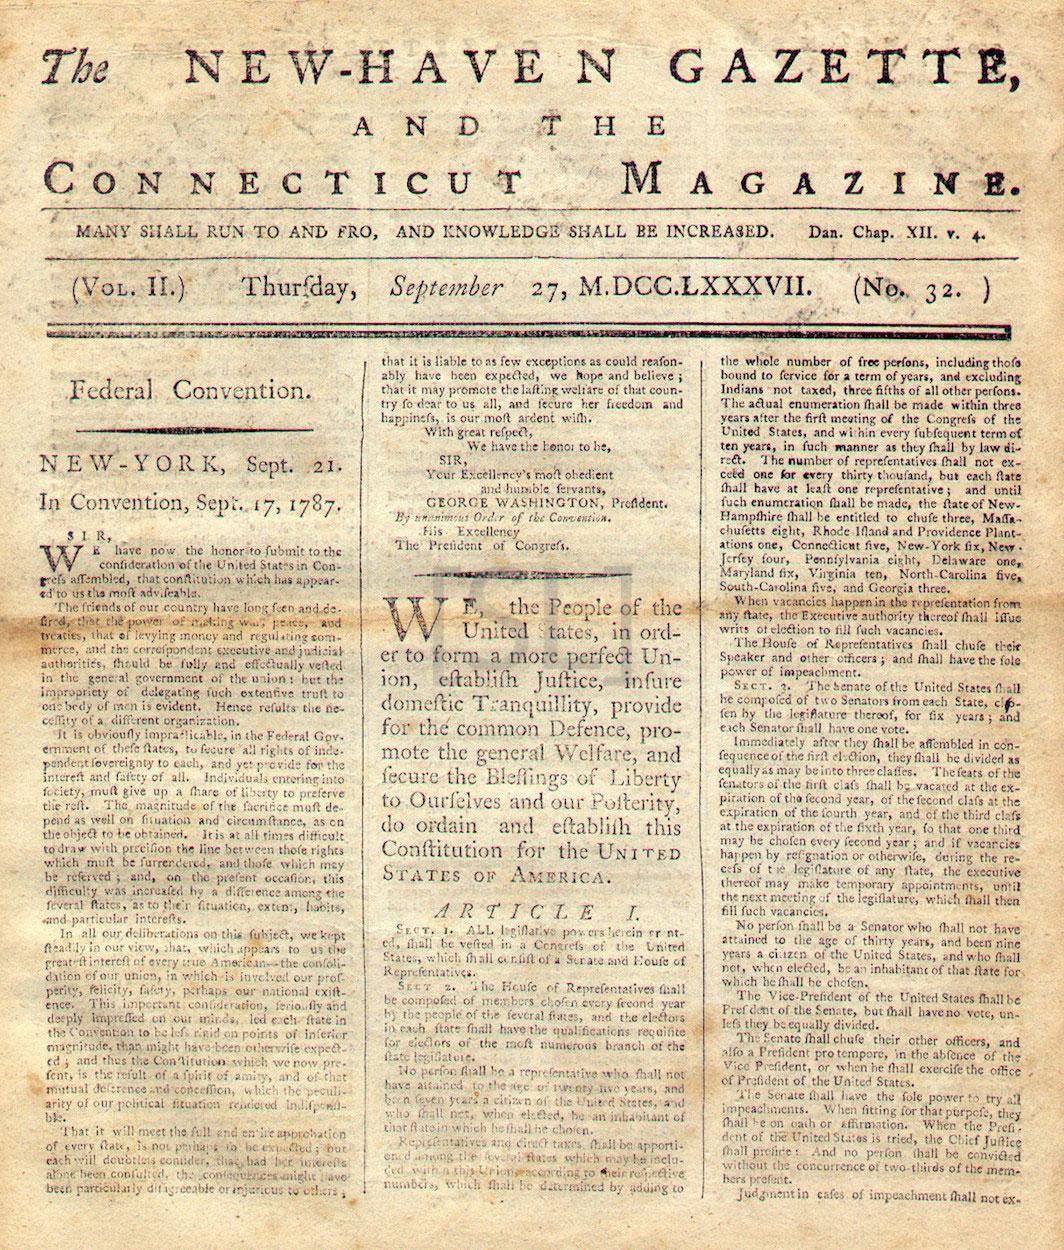 New-Haven Gazette